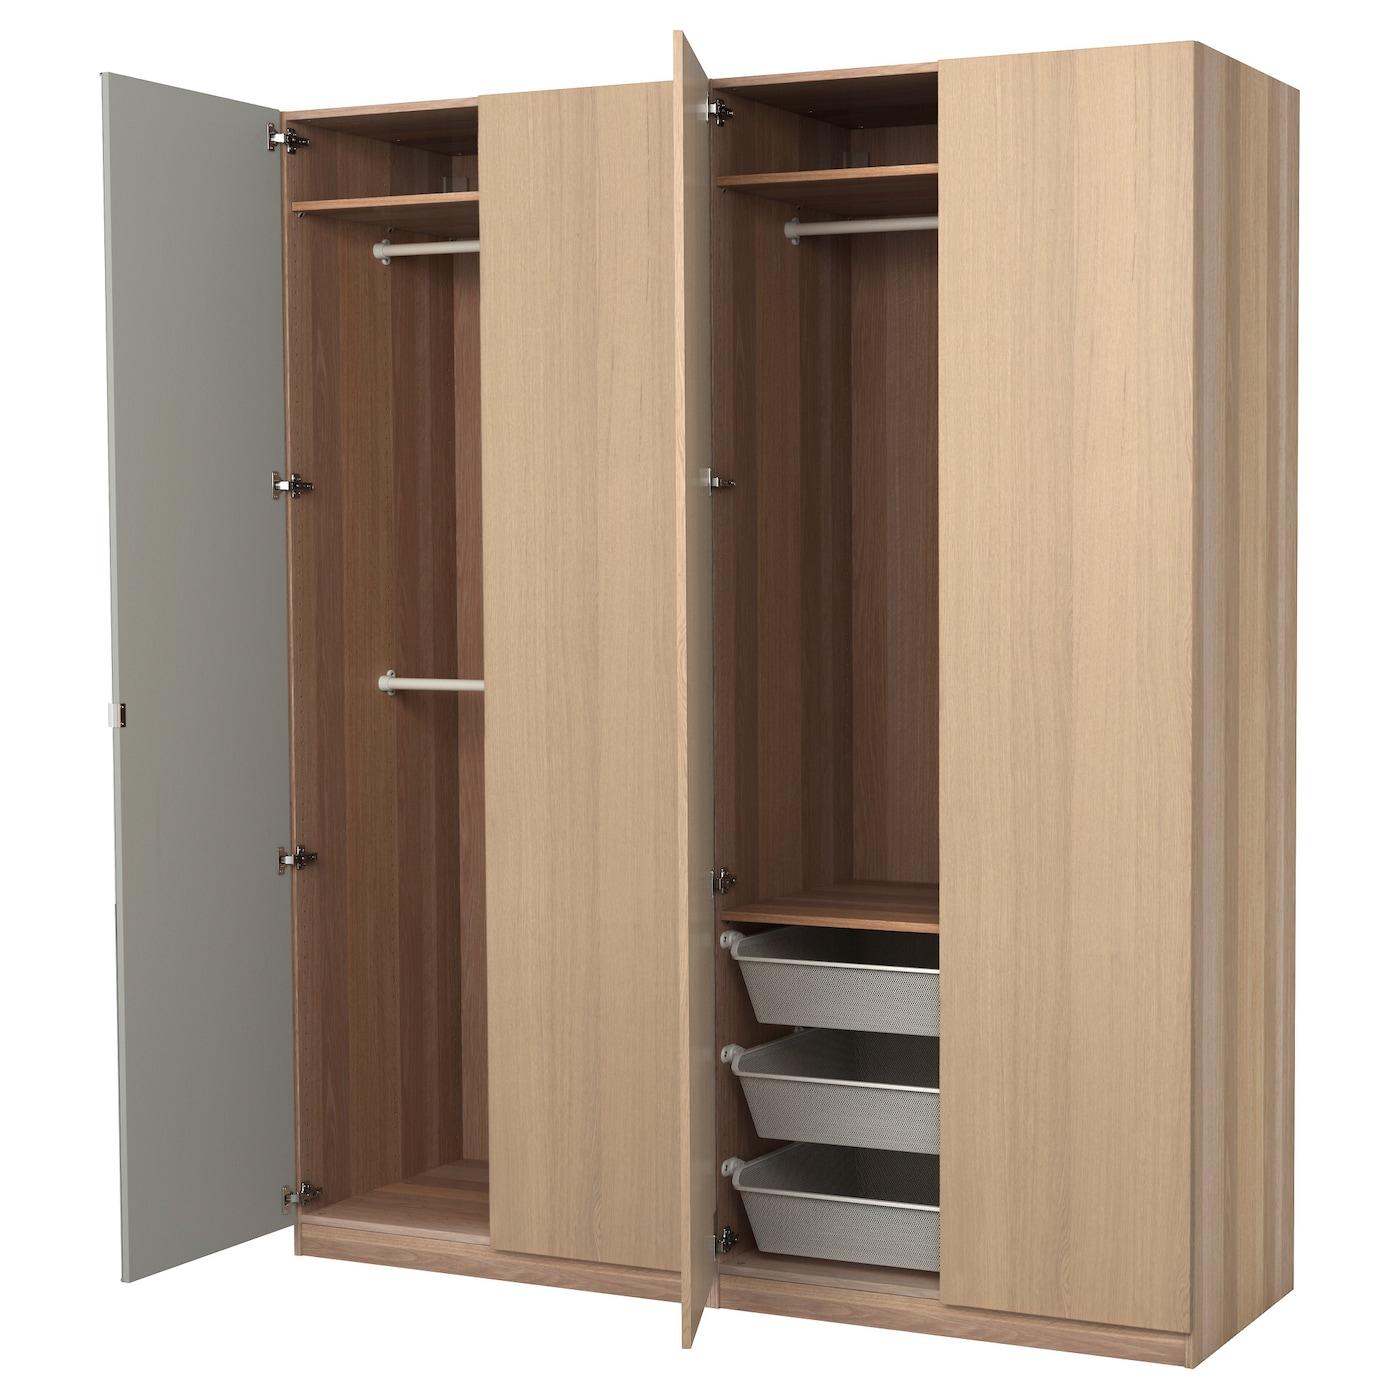 pax armoire penderie effet ch ne blanchi nexus vikedal. Black Bedroom Furniture Sets. Home Design Ideas